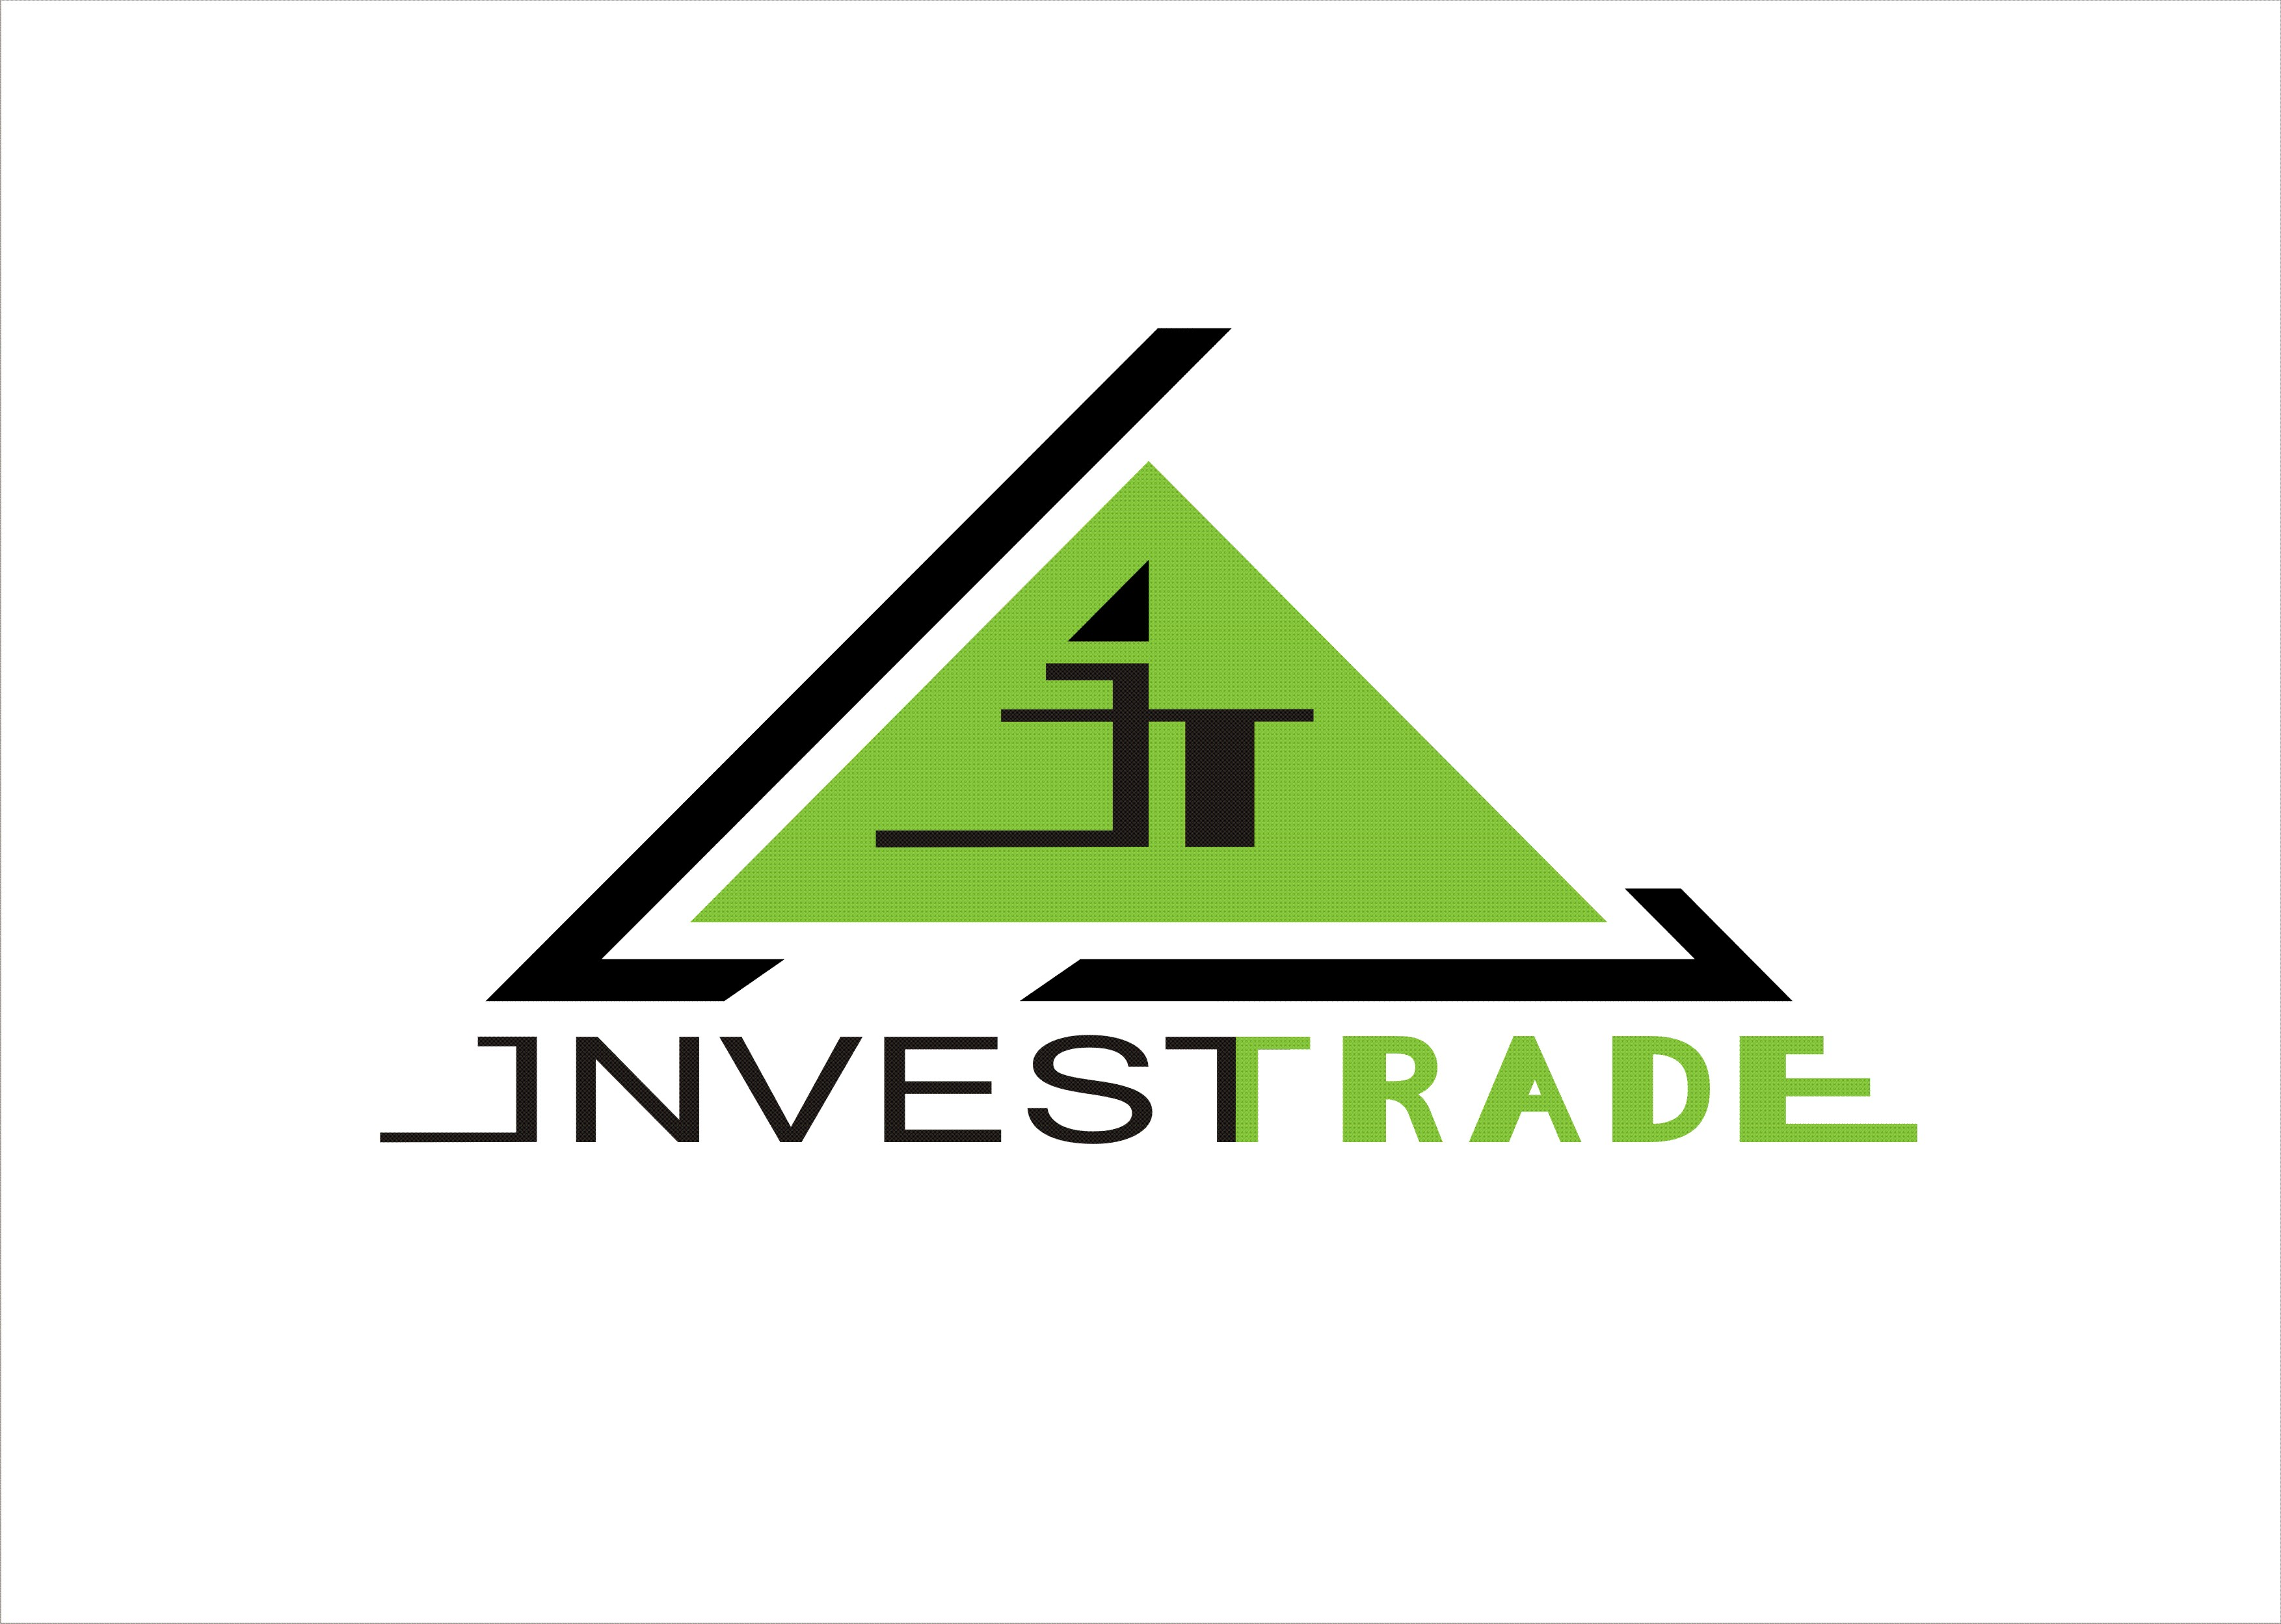 Разработка логотипа для компании Invest trade фото f_96051240402da096.jpg